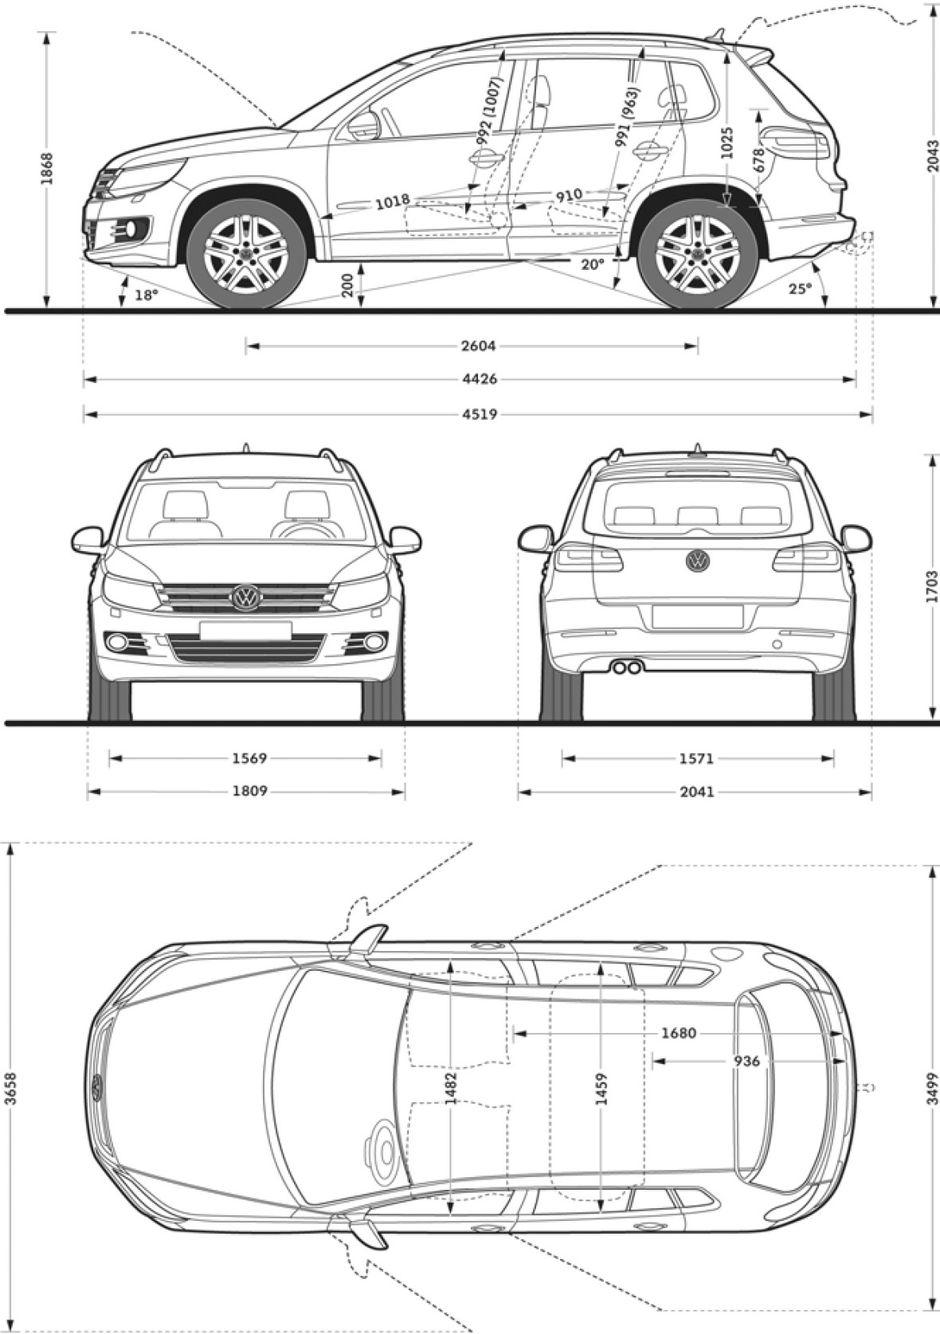 Jaguar Mk9 Wiring Diagram Another Blog About Xk 150 Xk150 Mg Midget